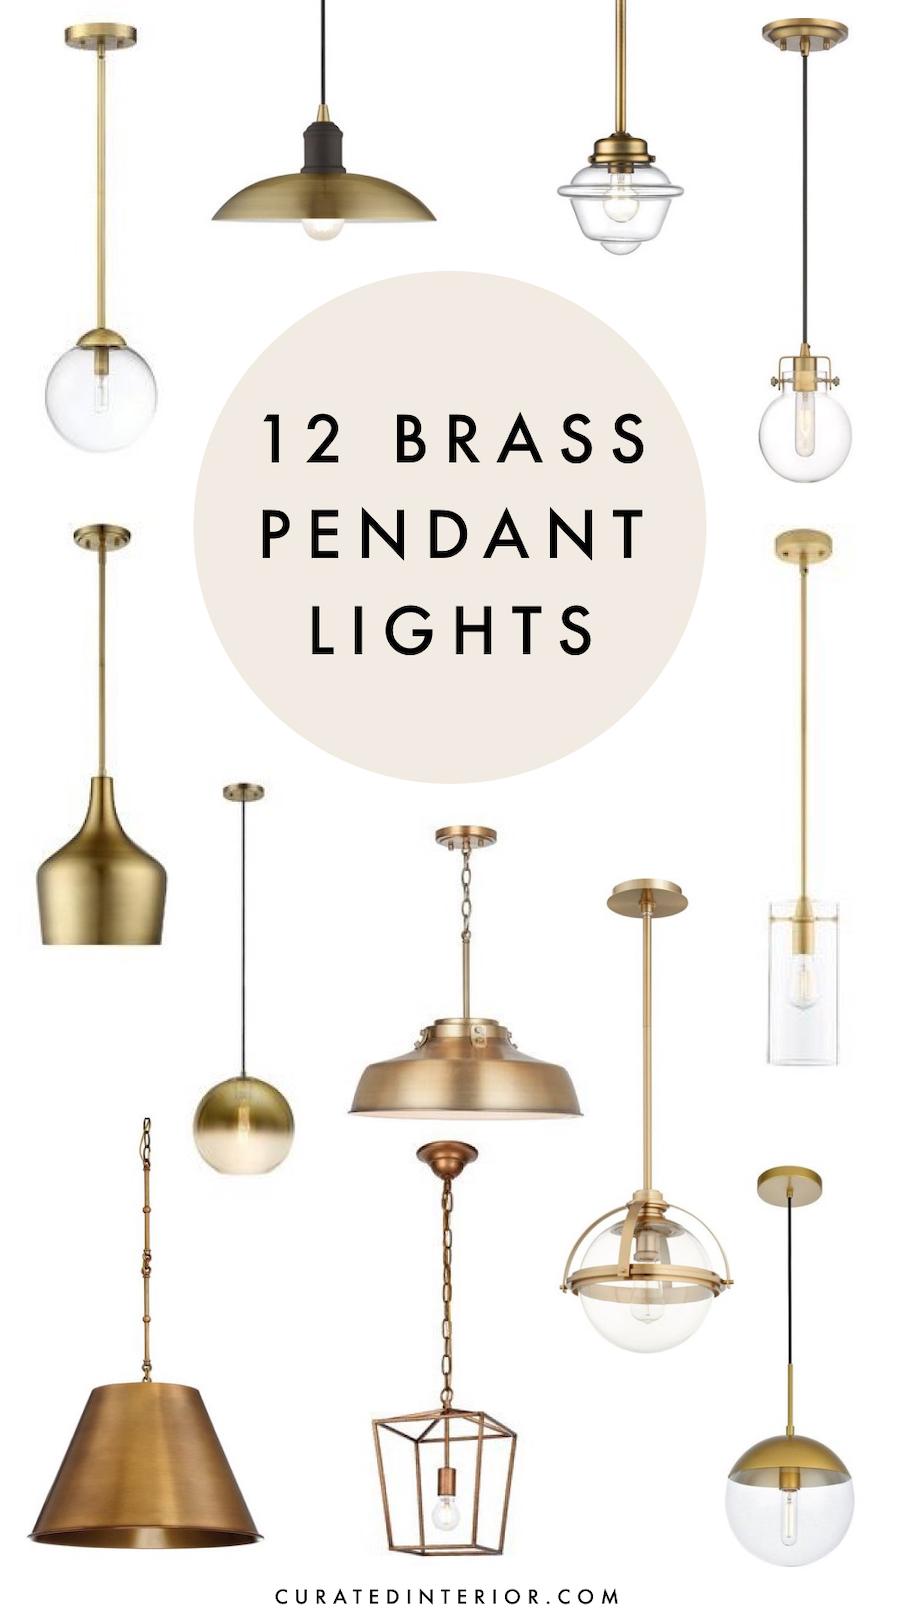 12 Brass Pendant Lights